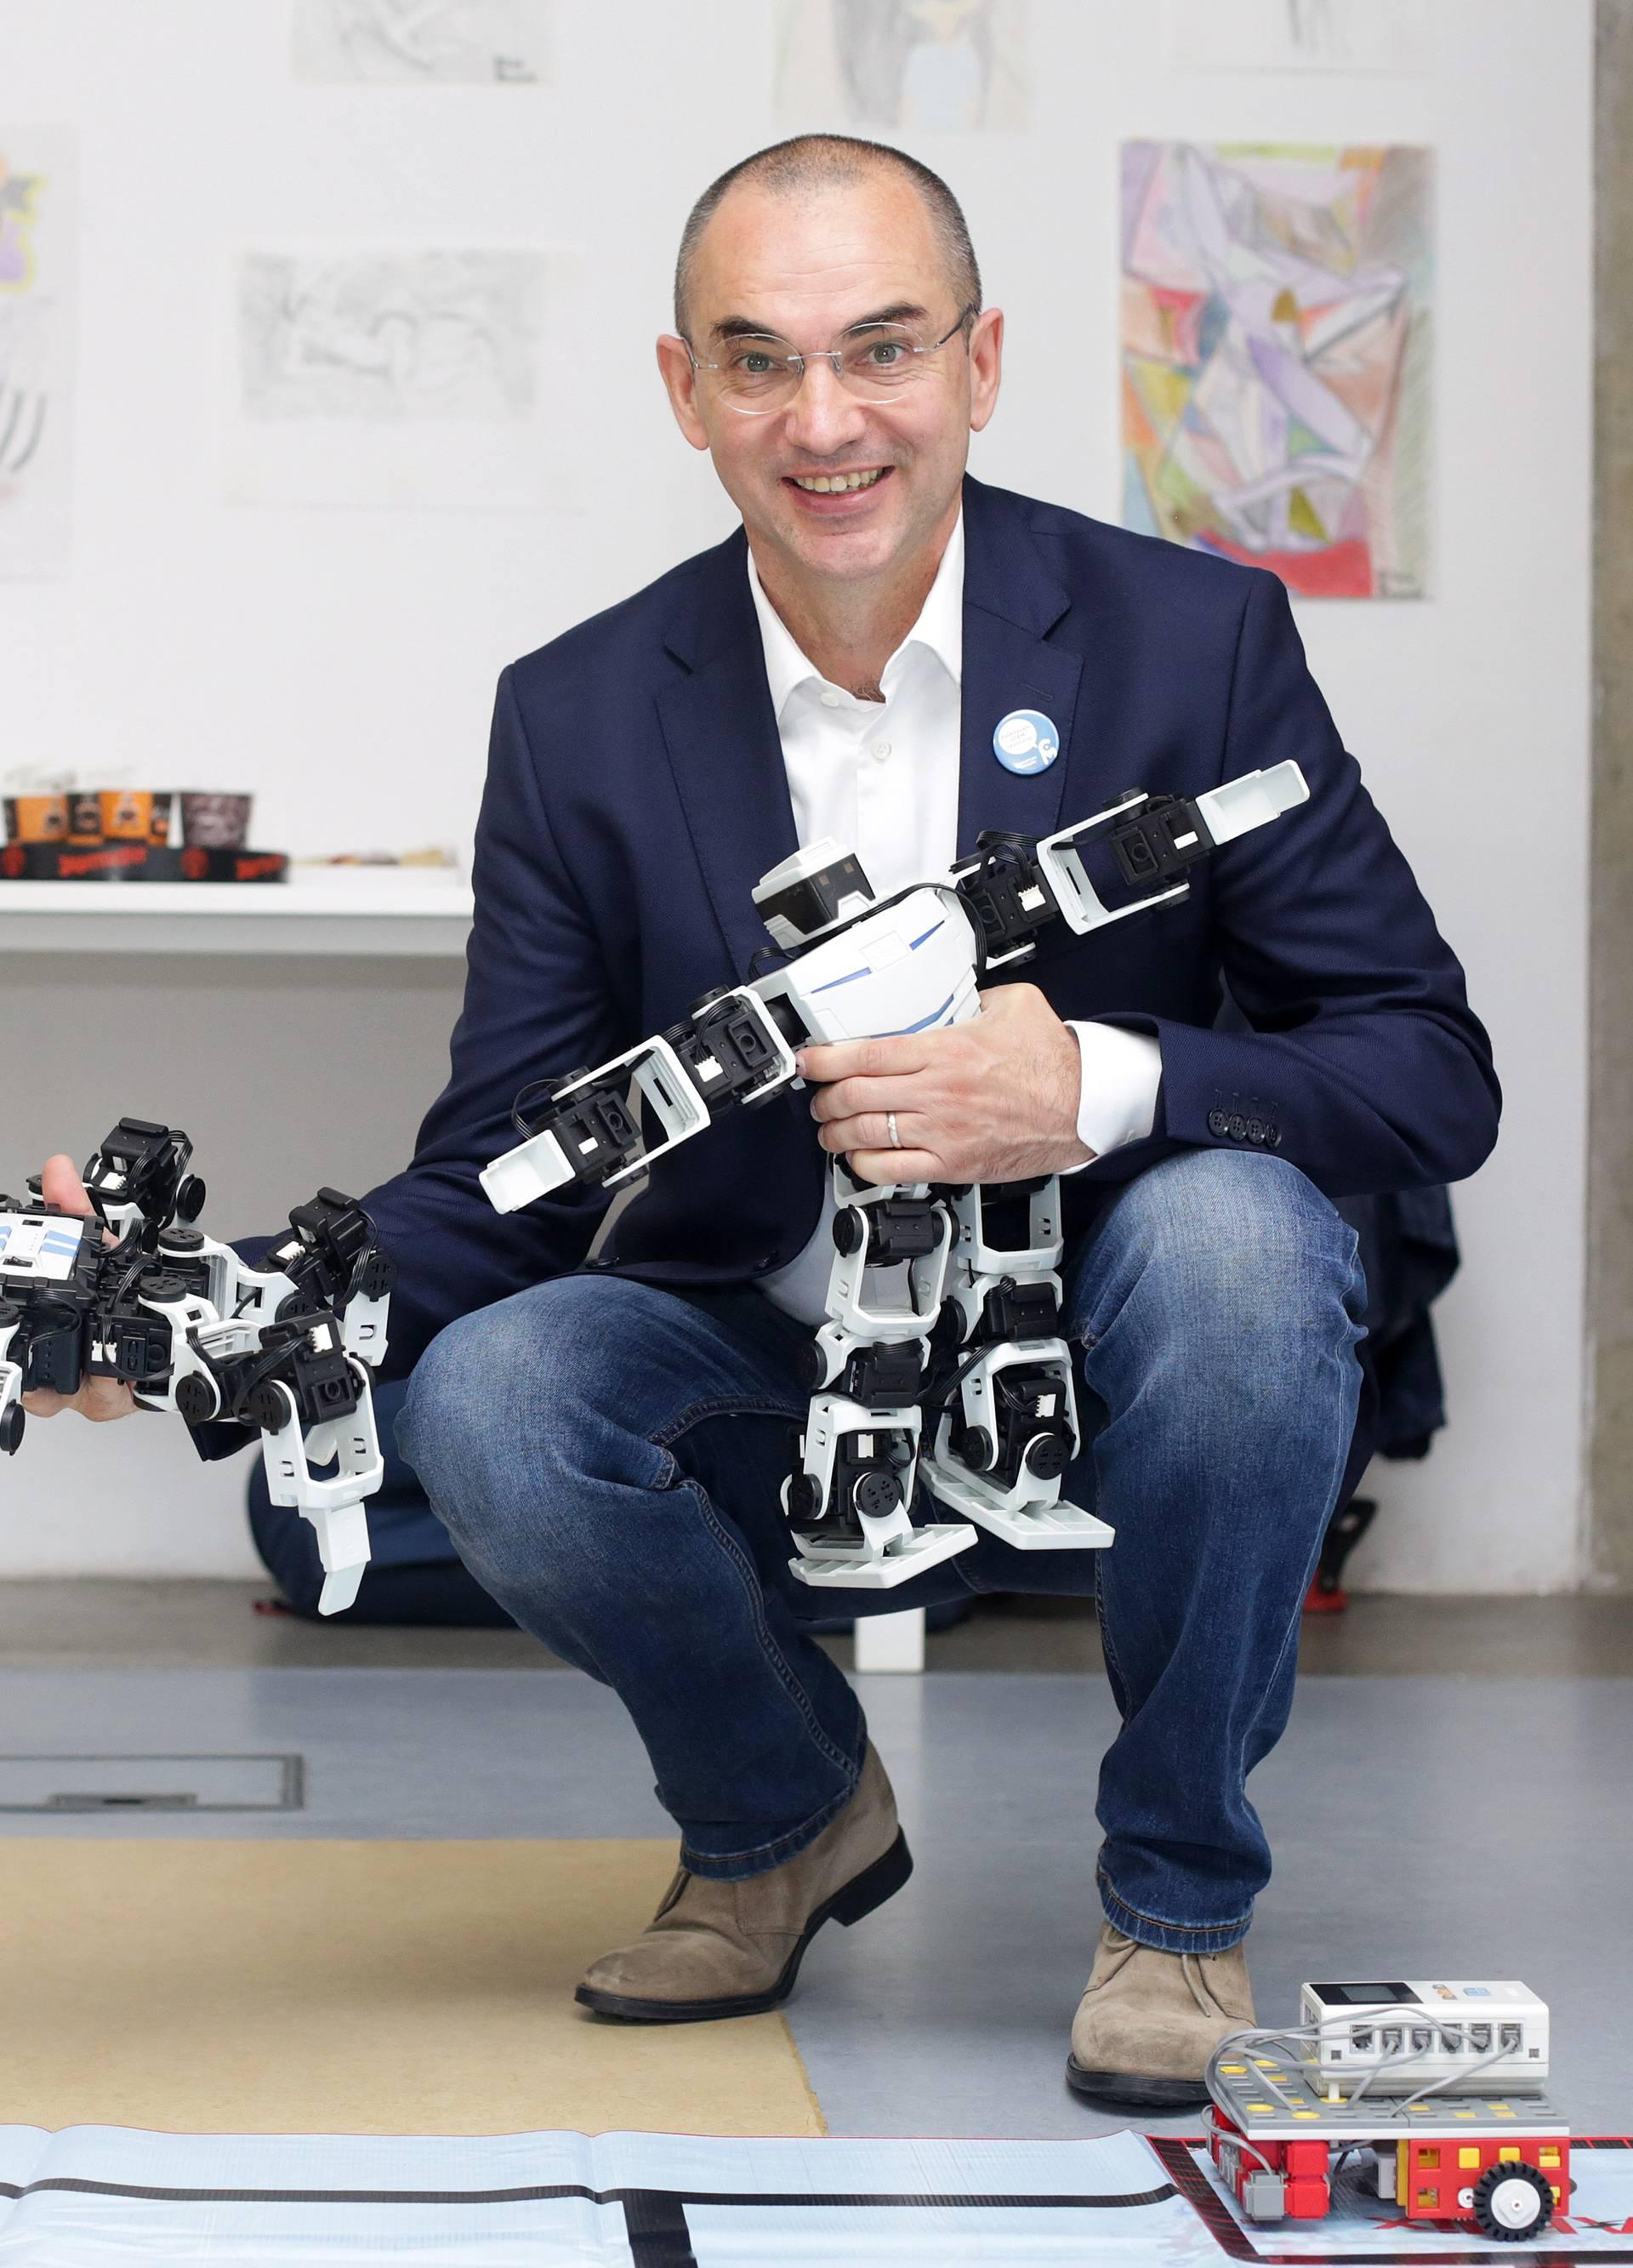 IT konferencija: Nenad Bakić predavao je o kulturi uspjeha